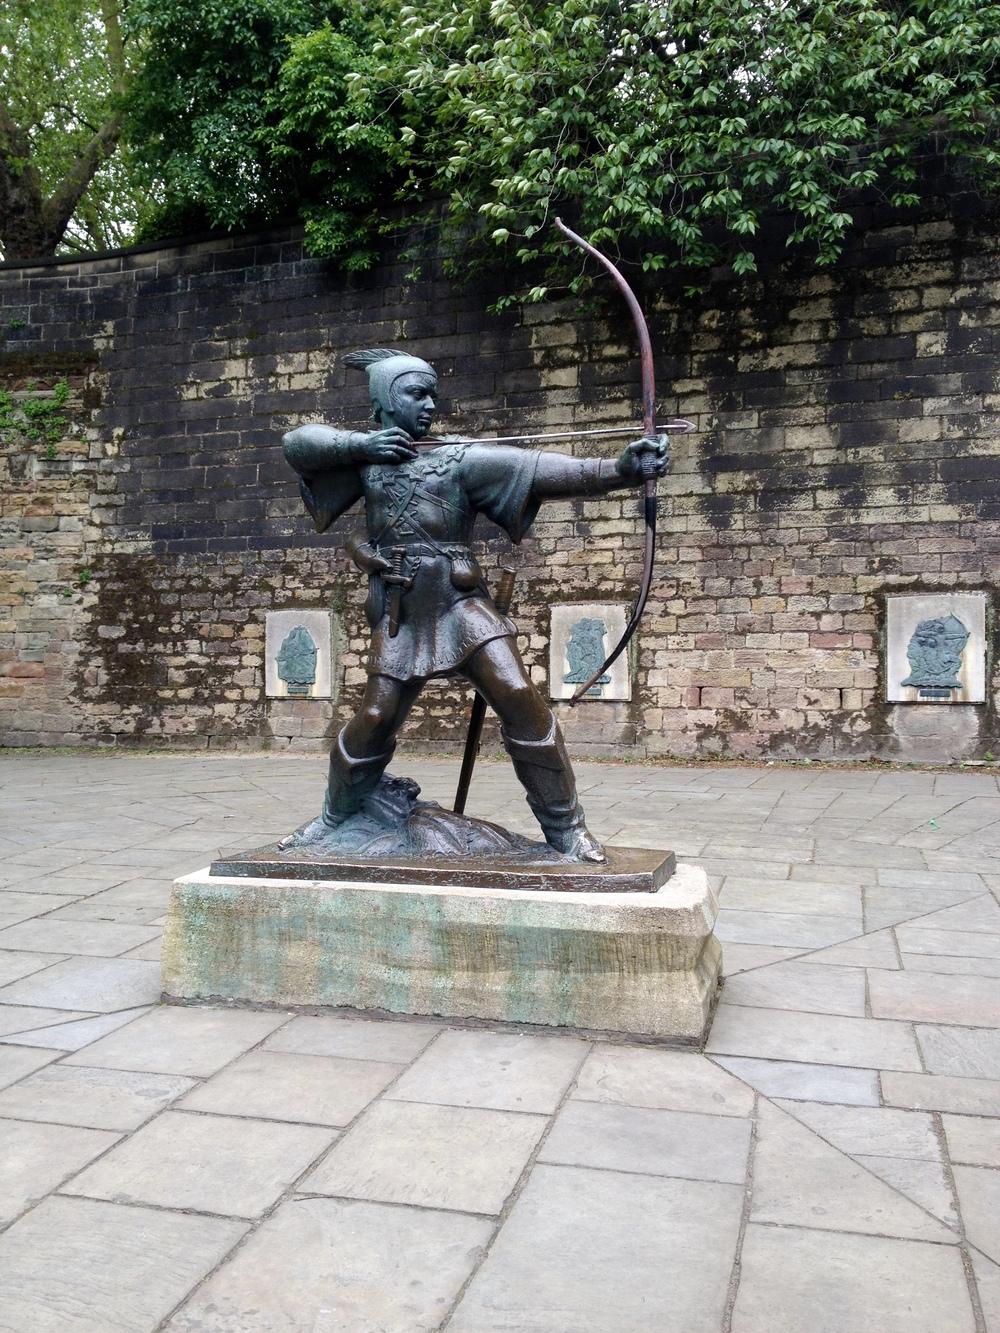 Statue of Robin Hood outside Nottingham Castle